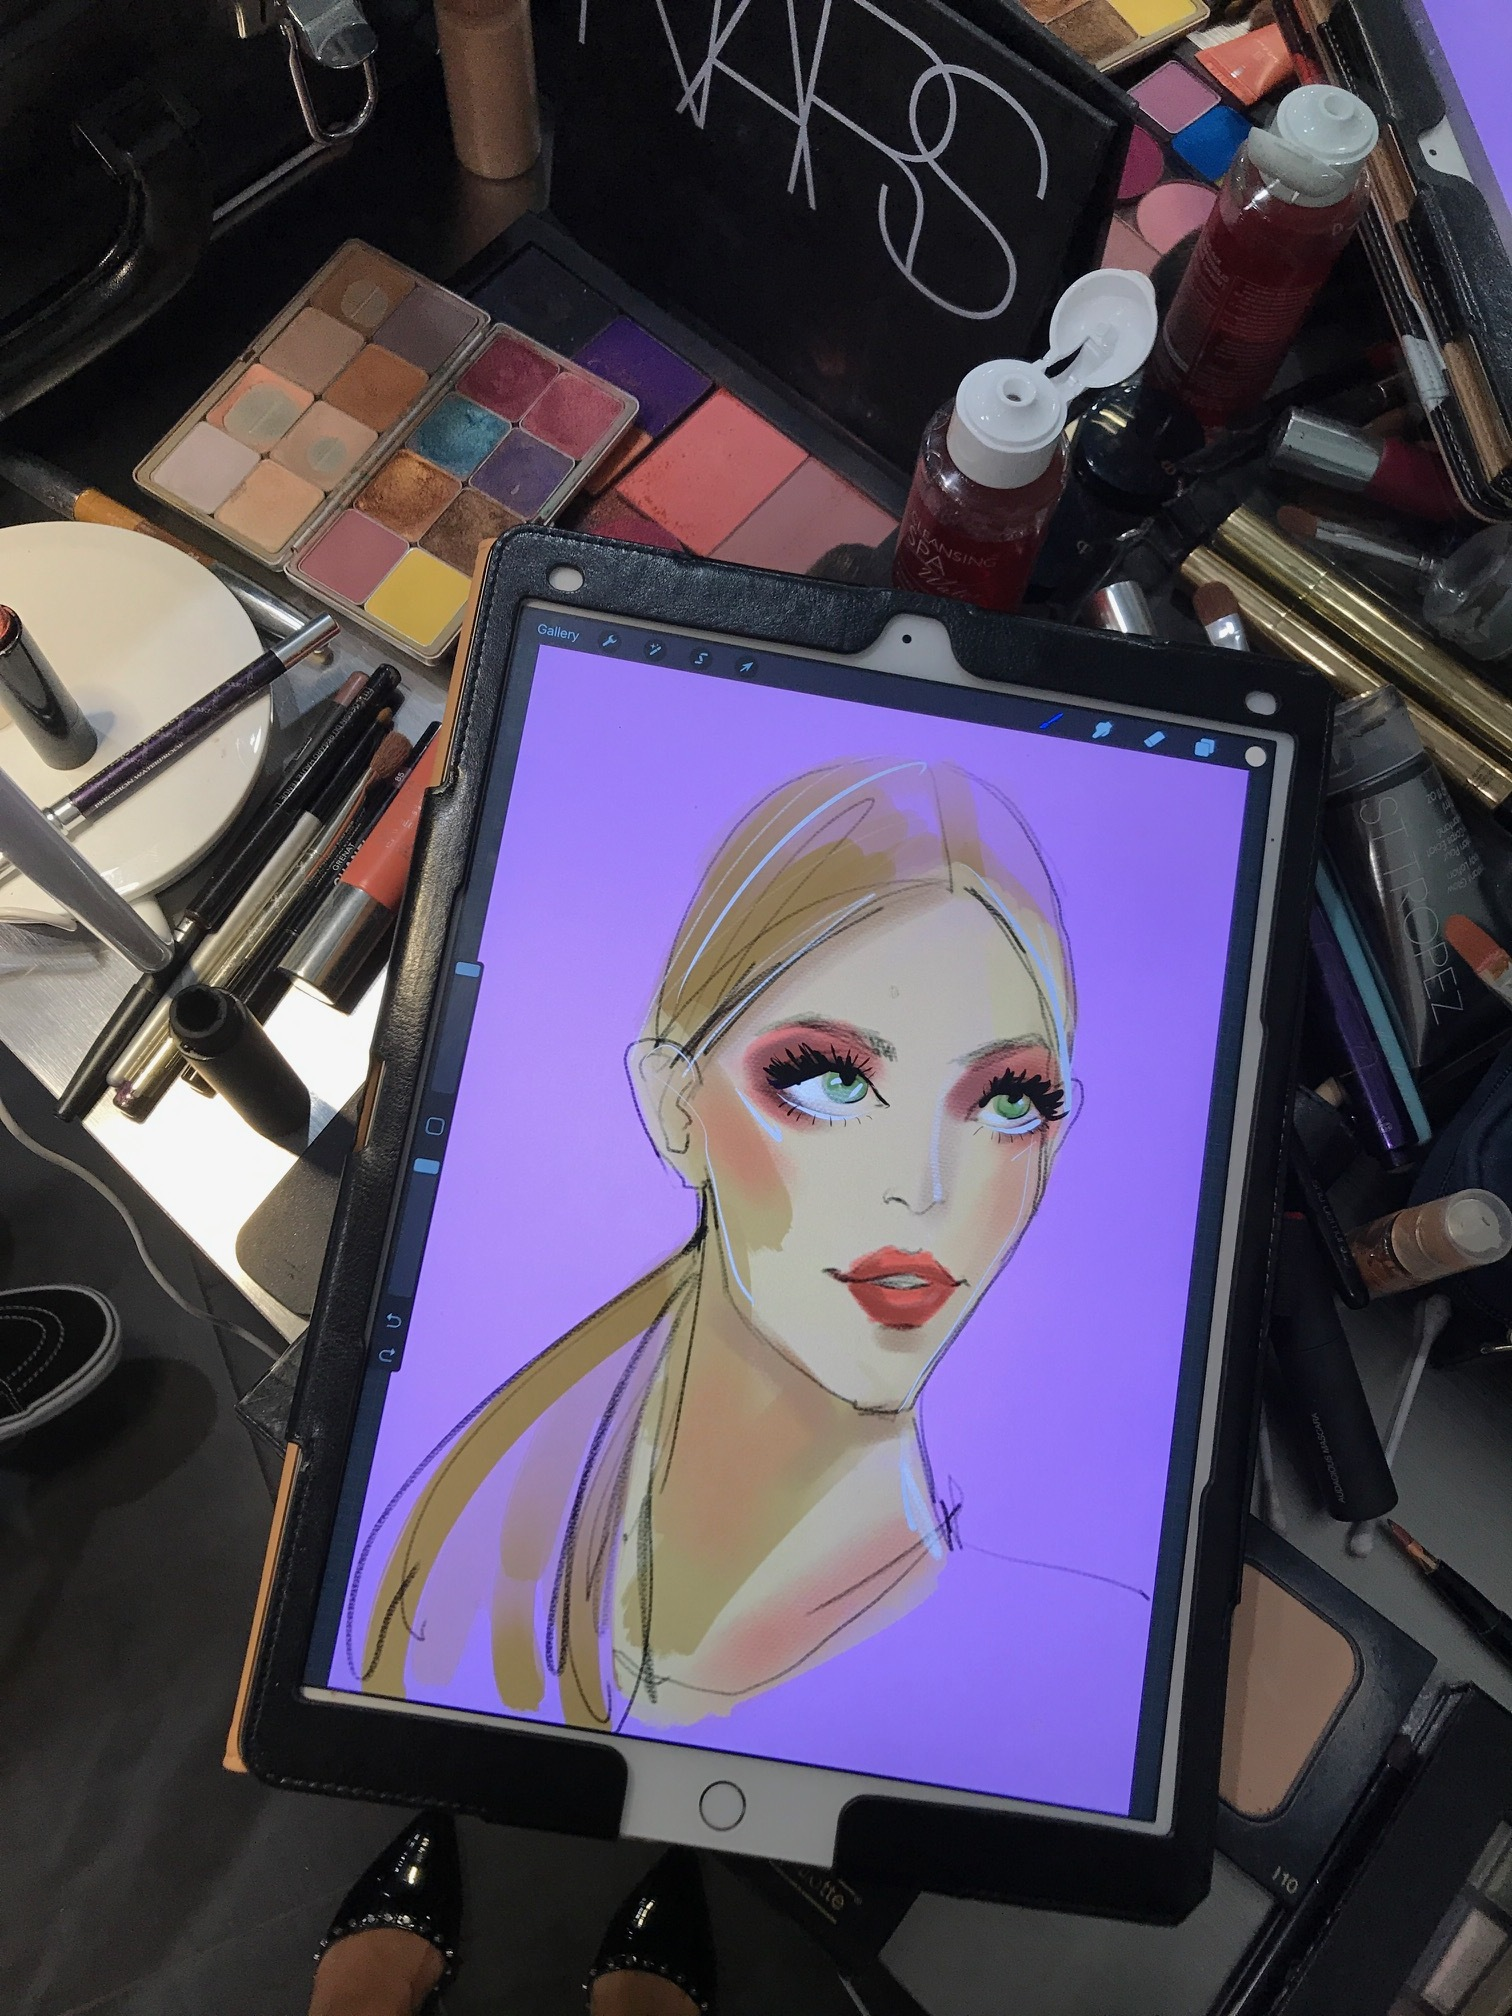 Beauty Illustration at FashionXHouston by Rongrong DeVoe use Procreate and Ipad Pro.JPG